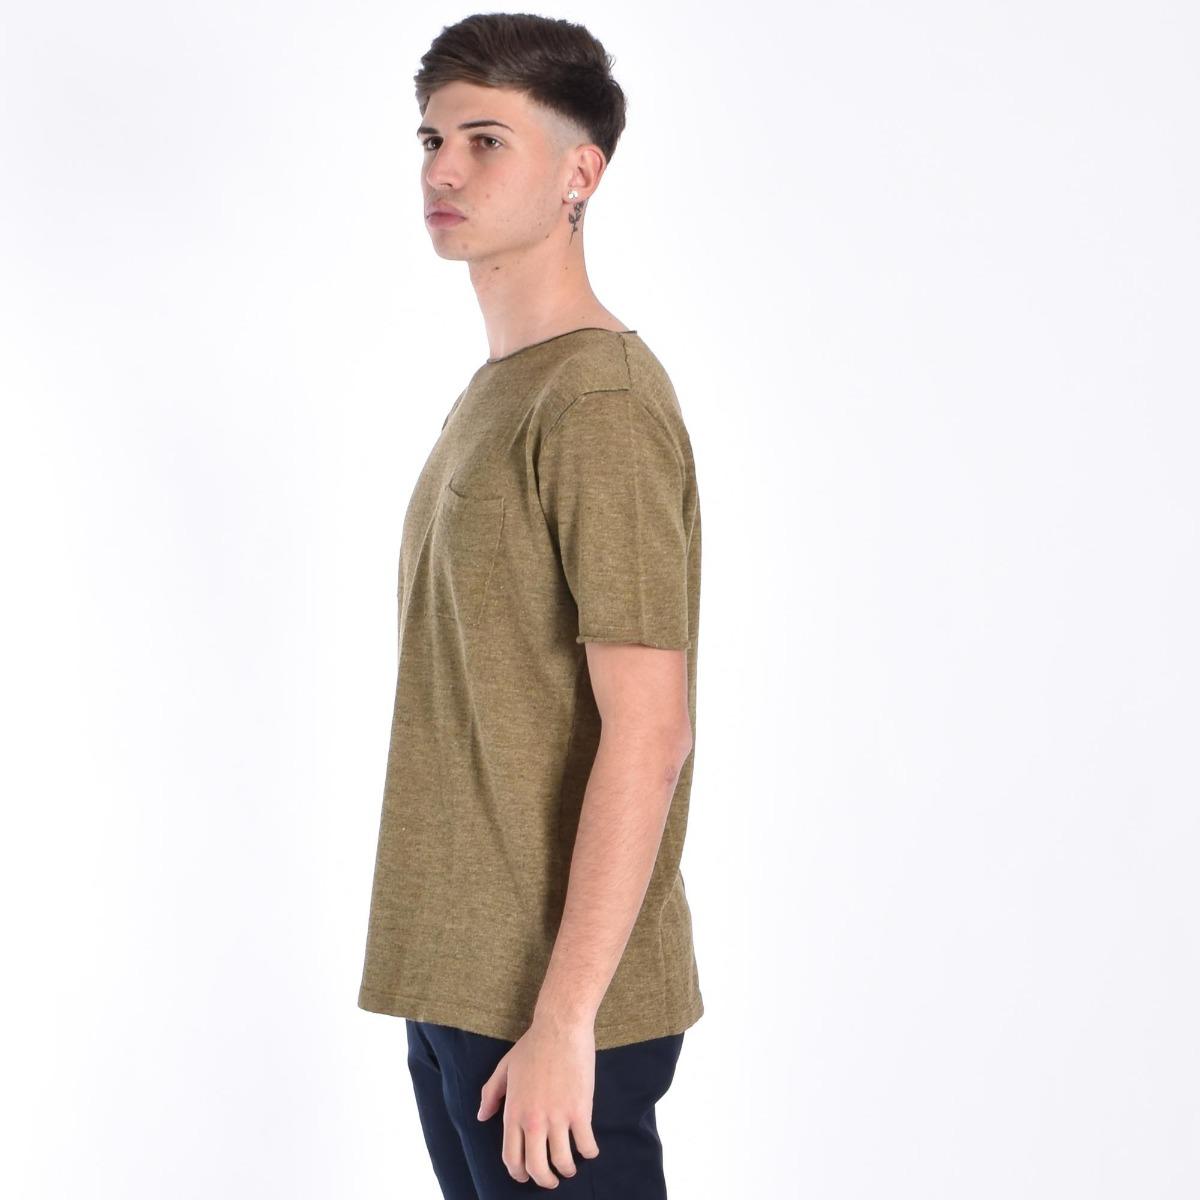 T-shirt con taschino - Verde oliva